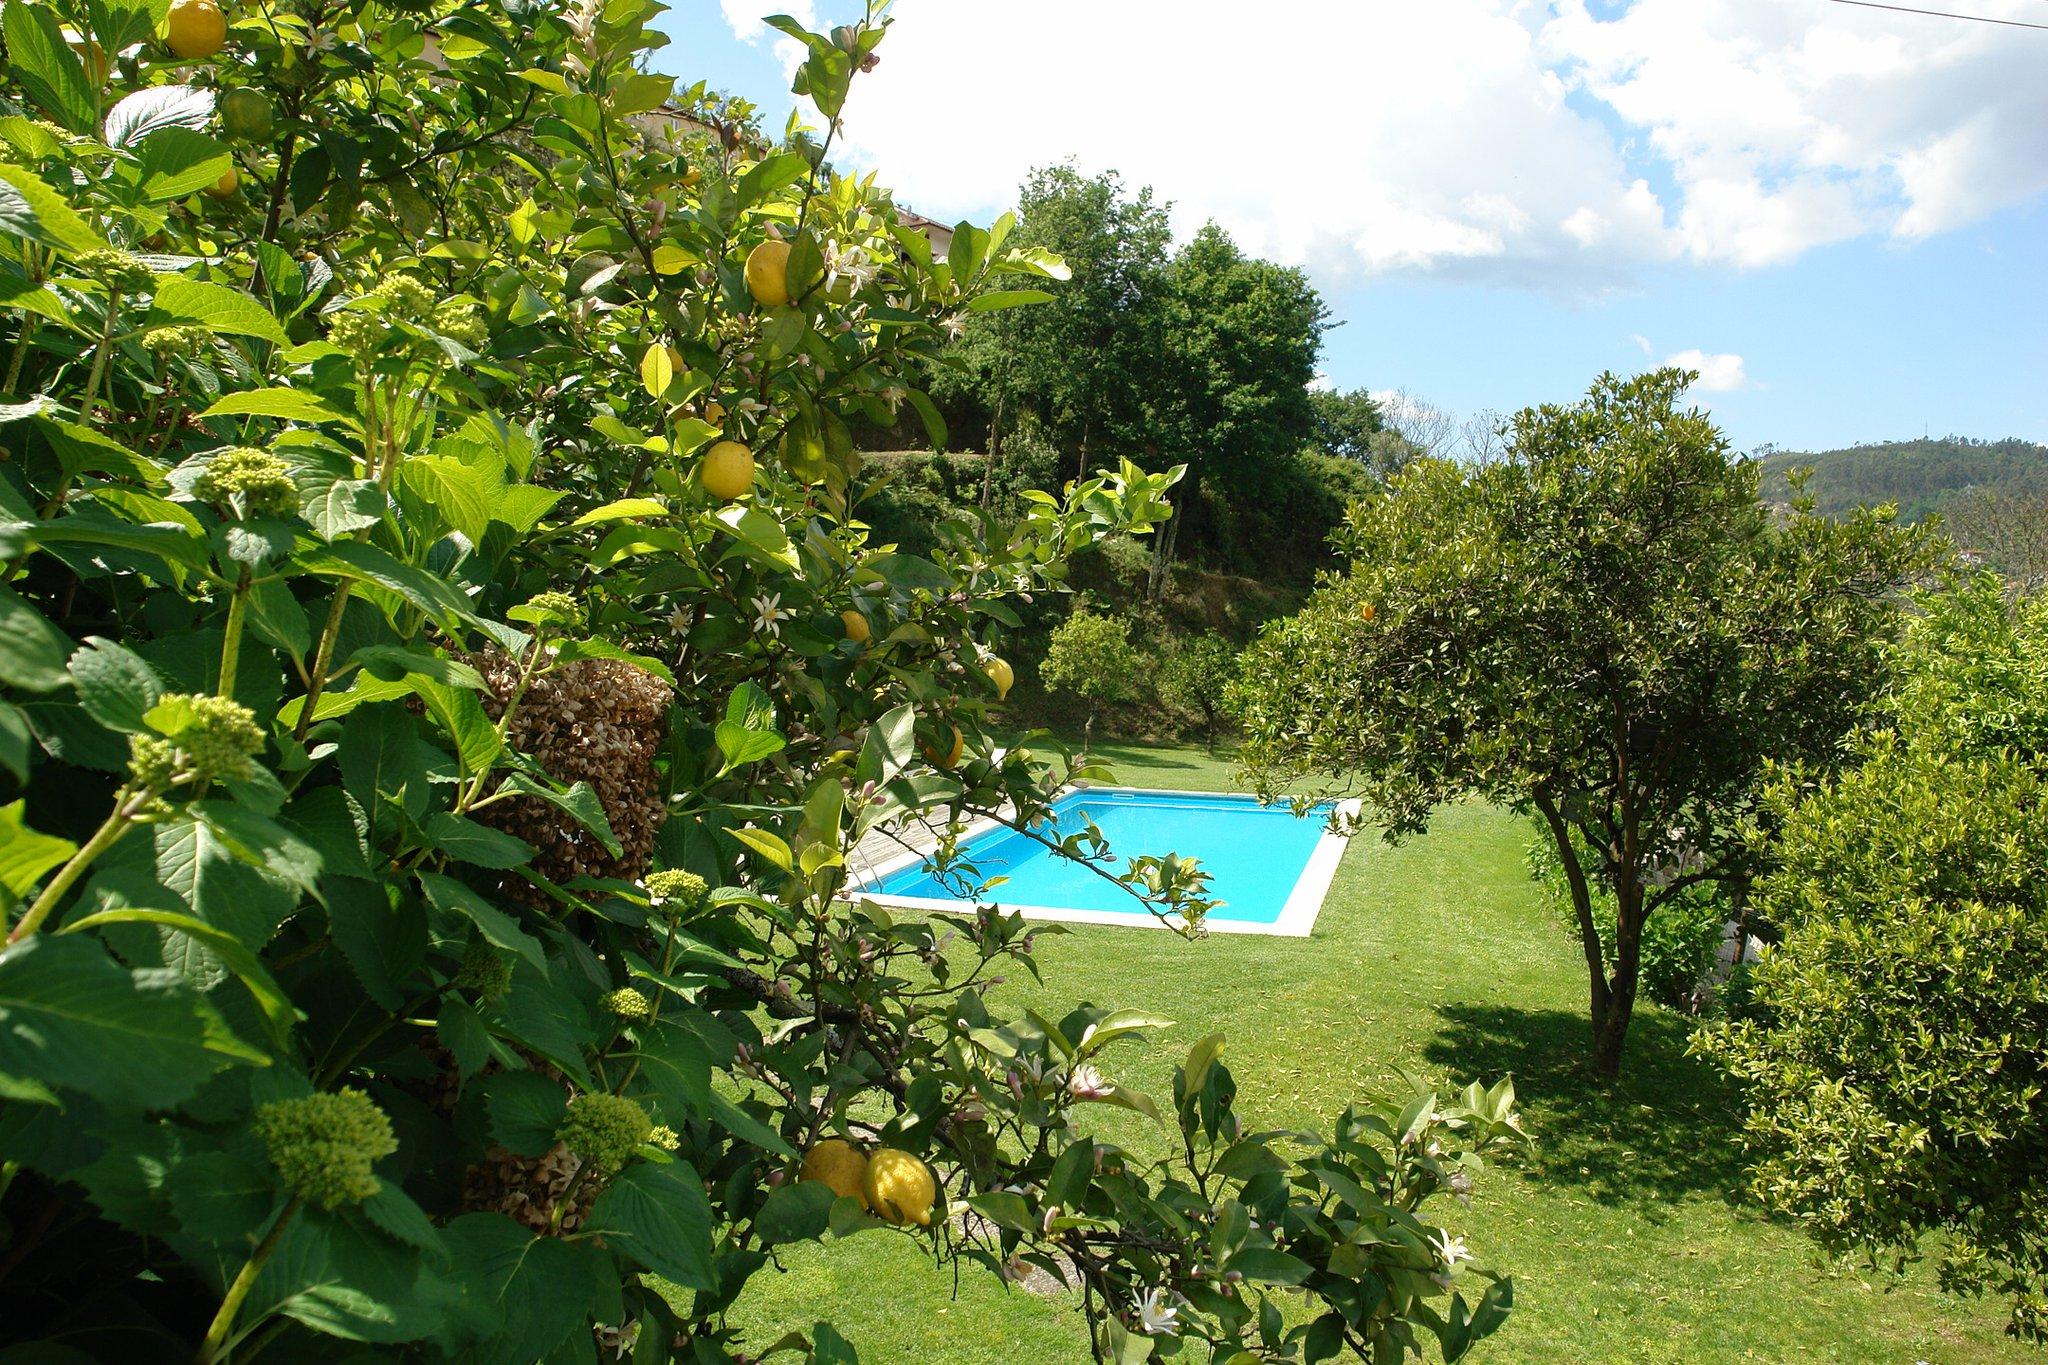 Alugar Casa Eira Junto Barragem Caniçada piscina